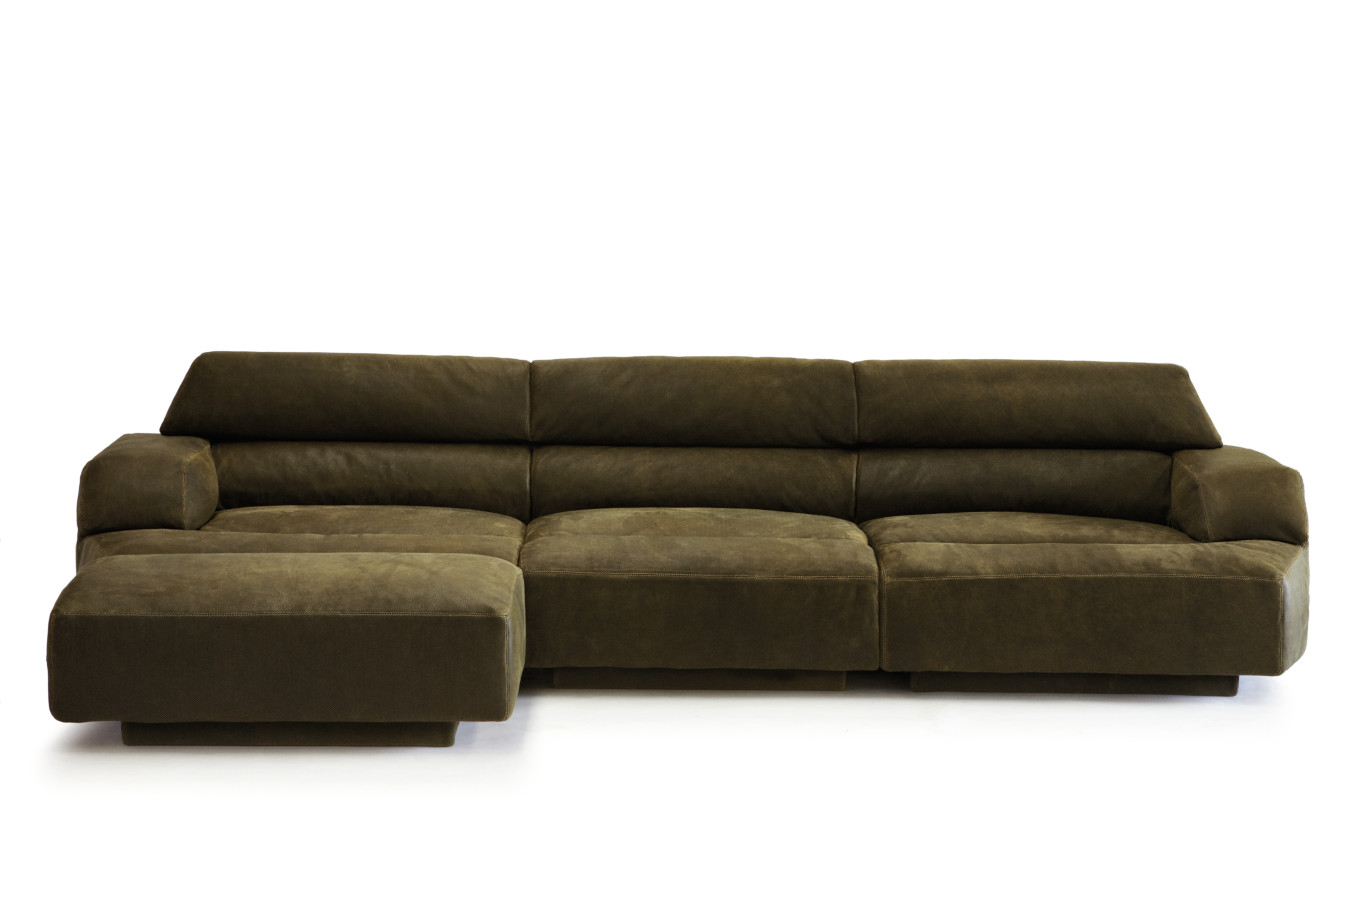 Full Size of Modulares Sofa Mit Schlaffunktion Lennon Westwing Leder Kissen Dhel Modular Set Flex Ikea Virgo Madeinitalyde Dreisitzer Comfortmaster Polster Reinigen Big Xxl Sofa Modulares Sofa